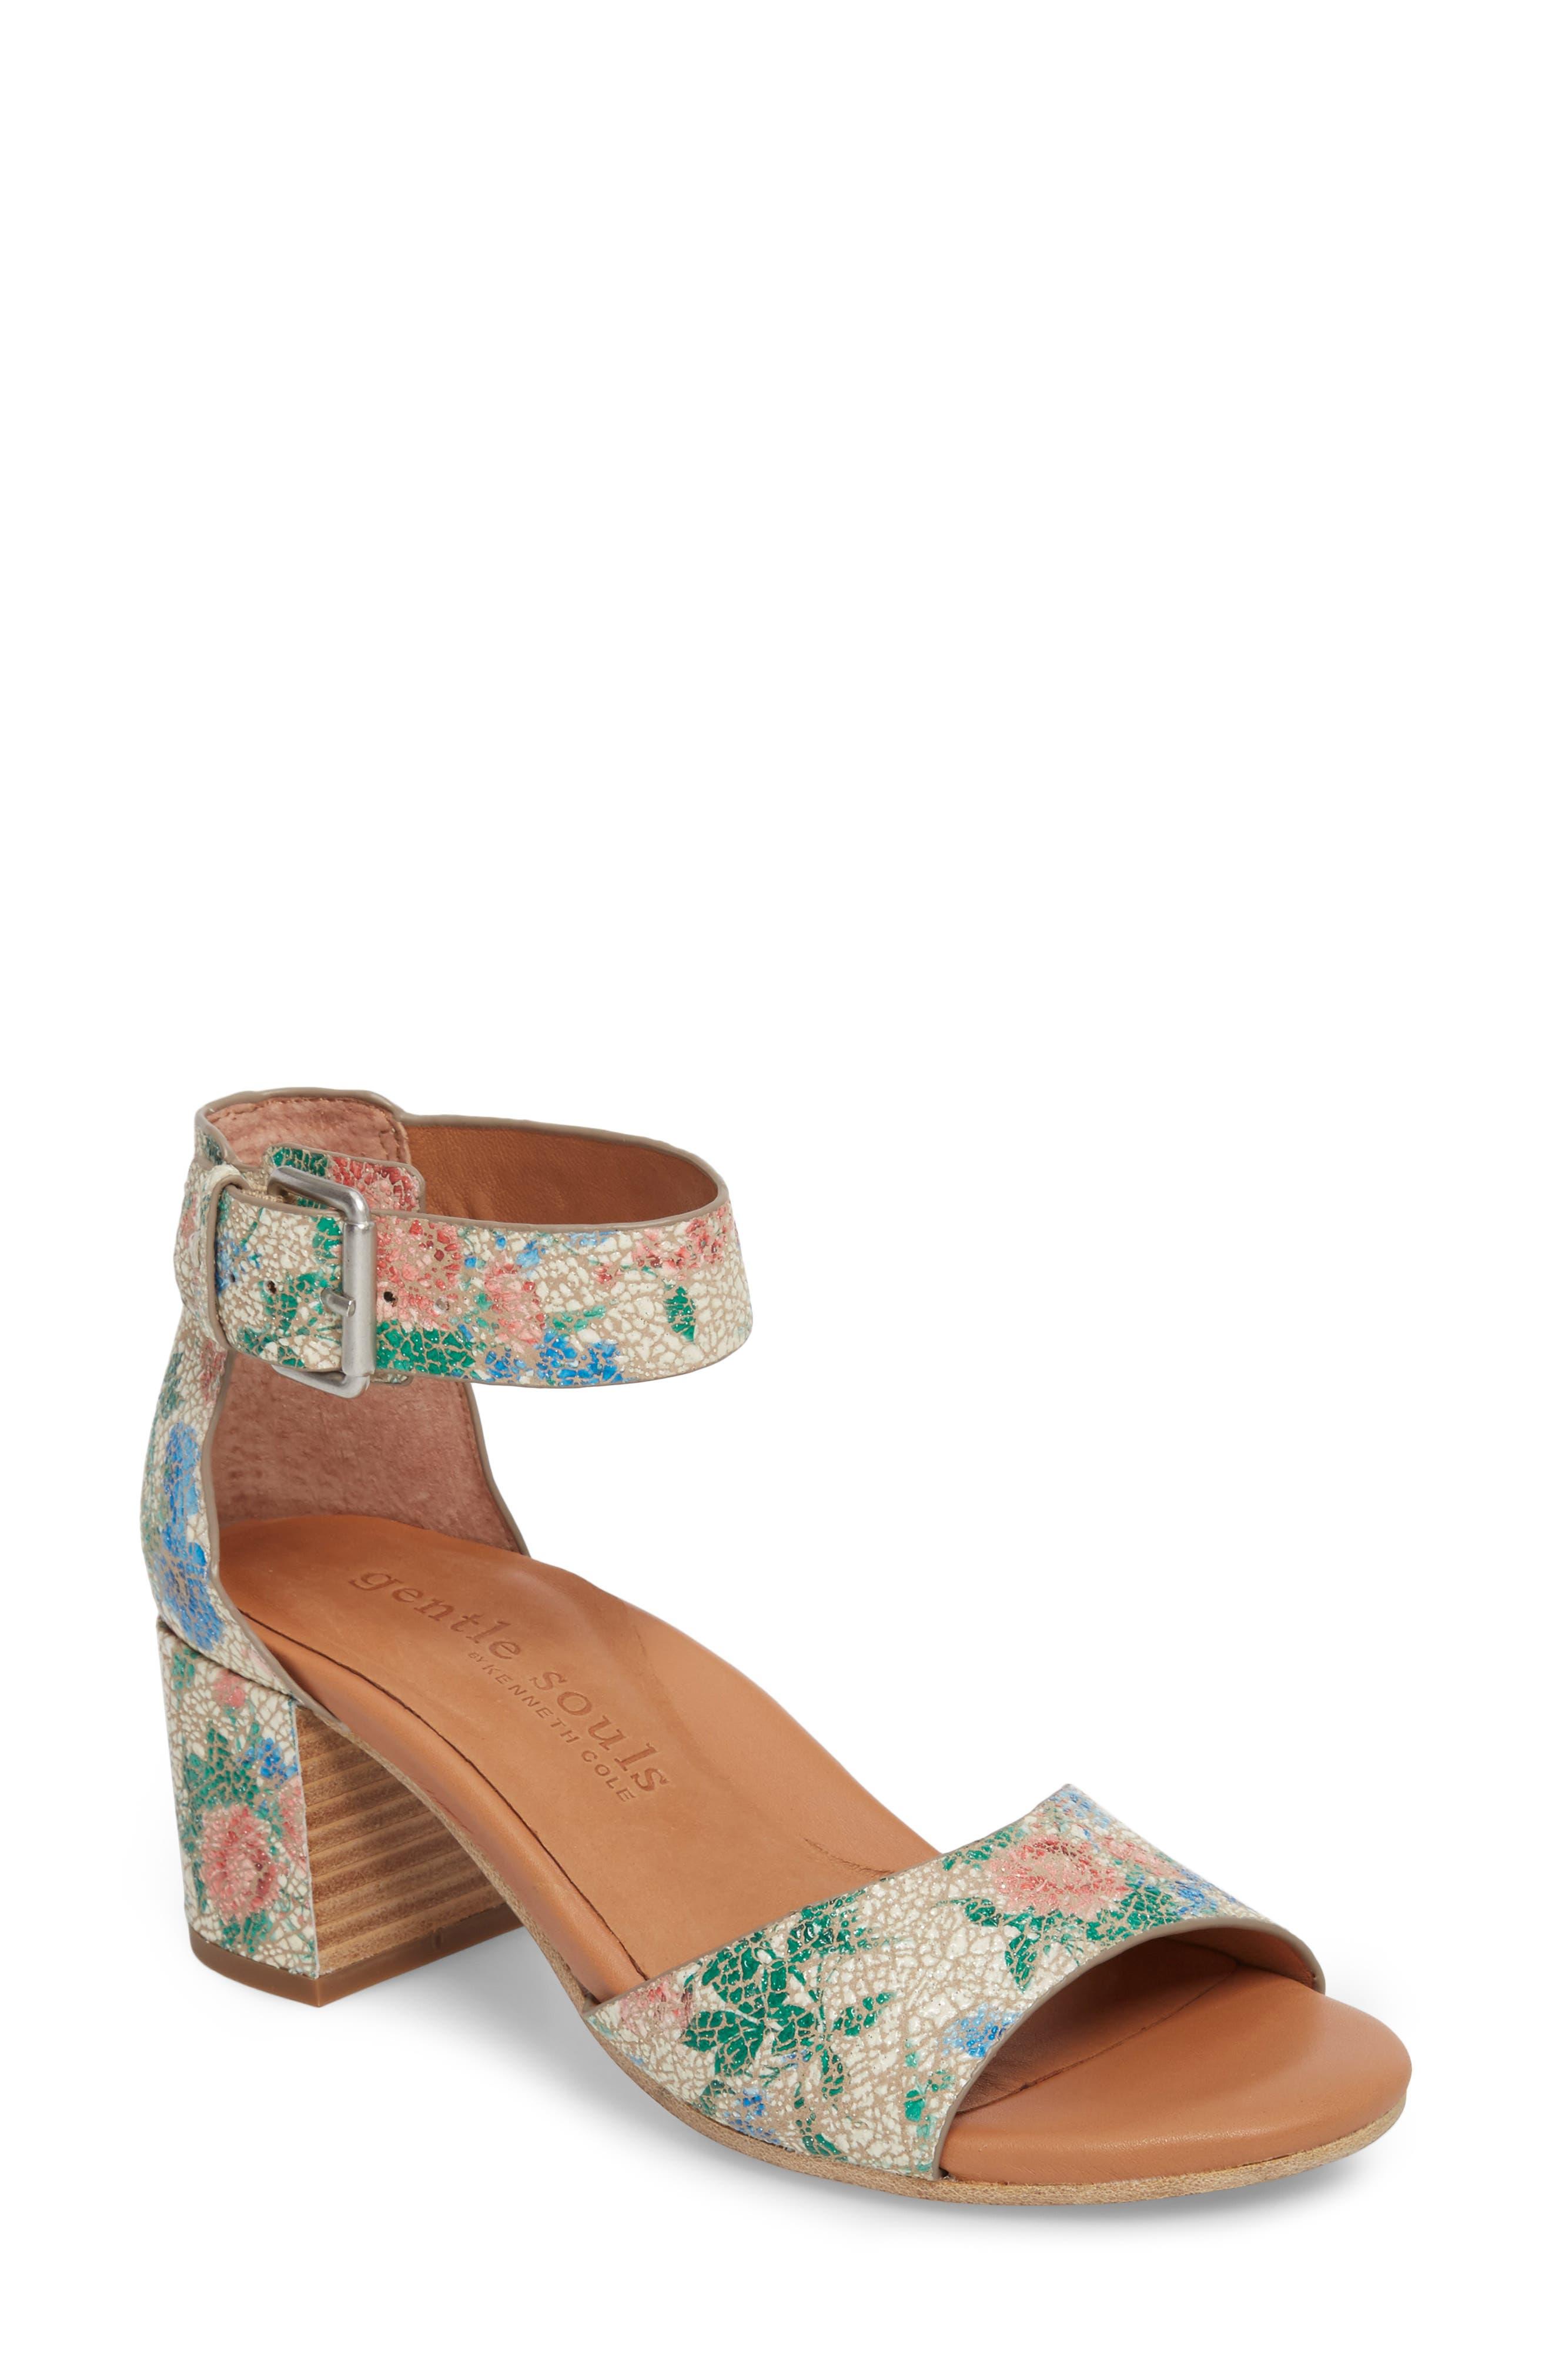 Alternate Image 1 Selected - Gentle Souls Christa Block Heel Sandal (Women)